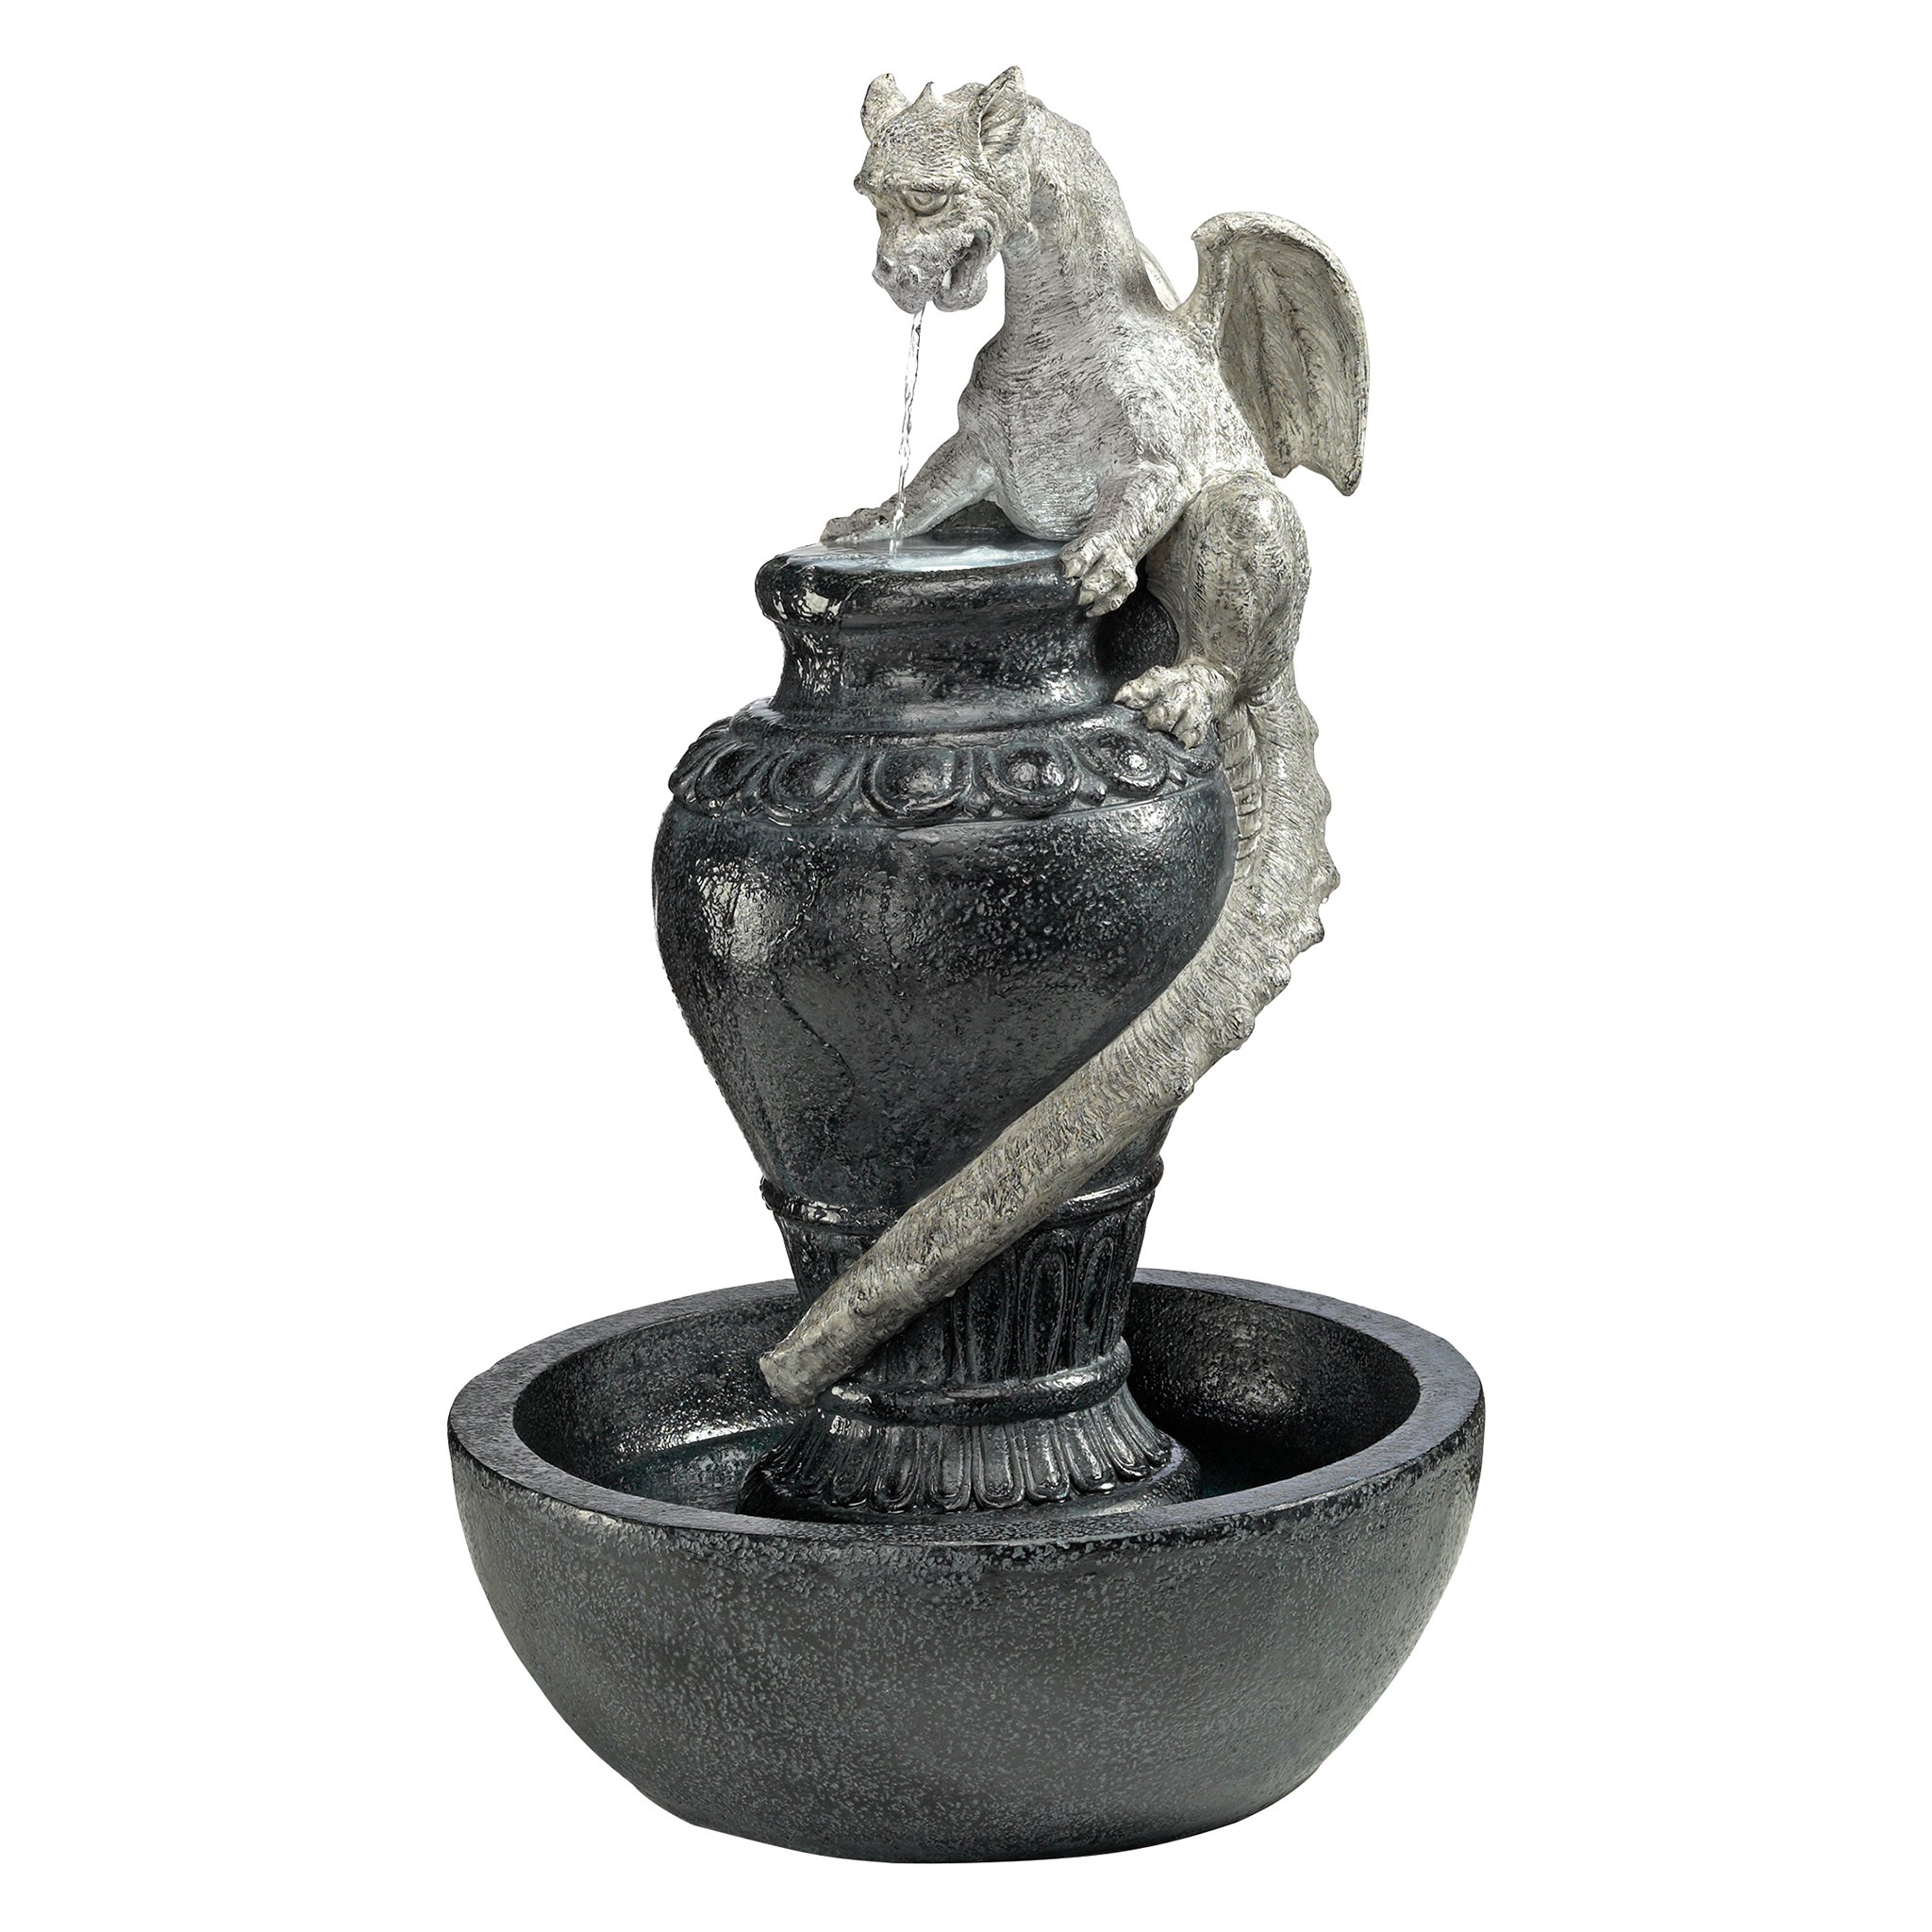 Design Toscano The Viper Dragon Sculptural Fountain